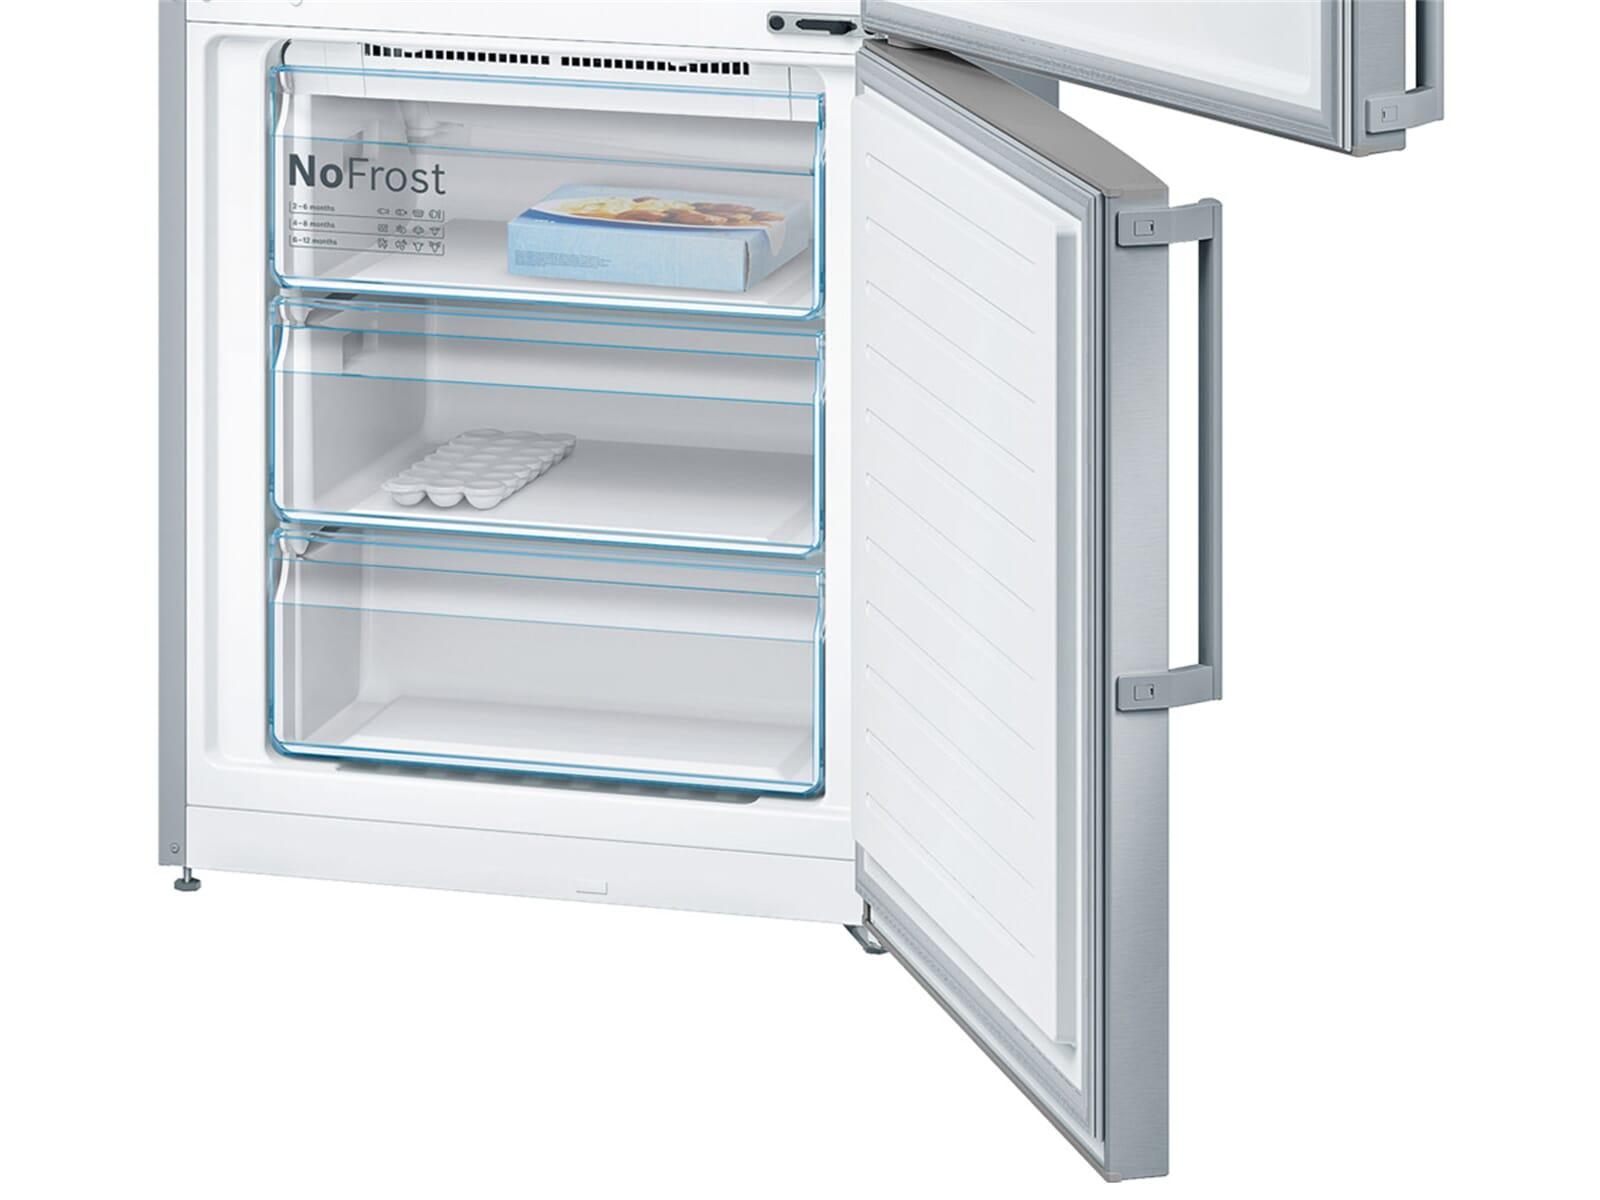 Bosch Kühlschrank Tür Wechseln : Bosch geschirrspüler tür justieren: bosch kühlschrank tür einstellen